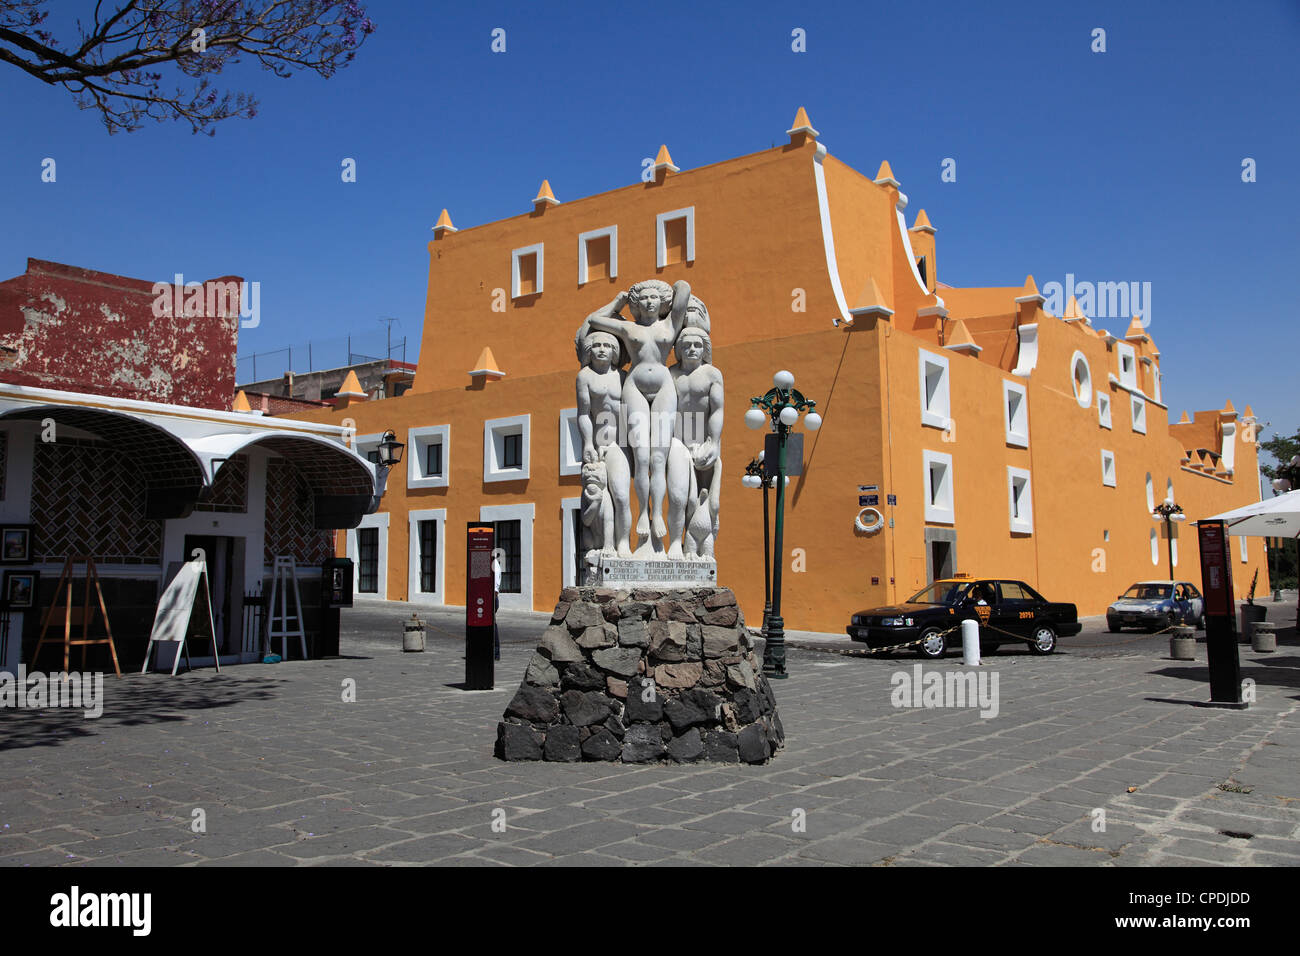 Genesis Statue, Artists Quarter (Barrio del Artista), Puebla, Historic Center, Puebla State, Mexico, North America - Stock Image